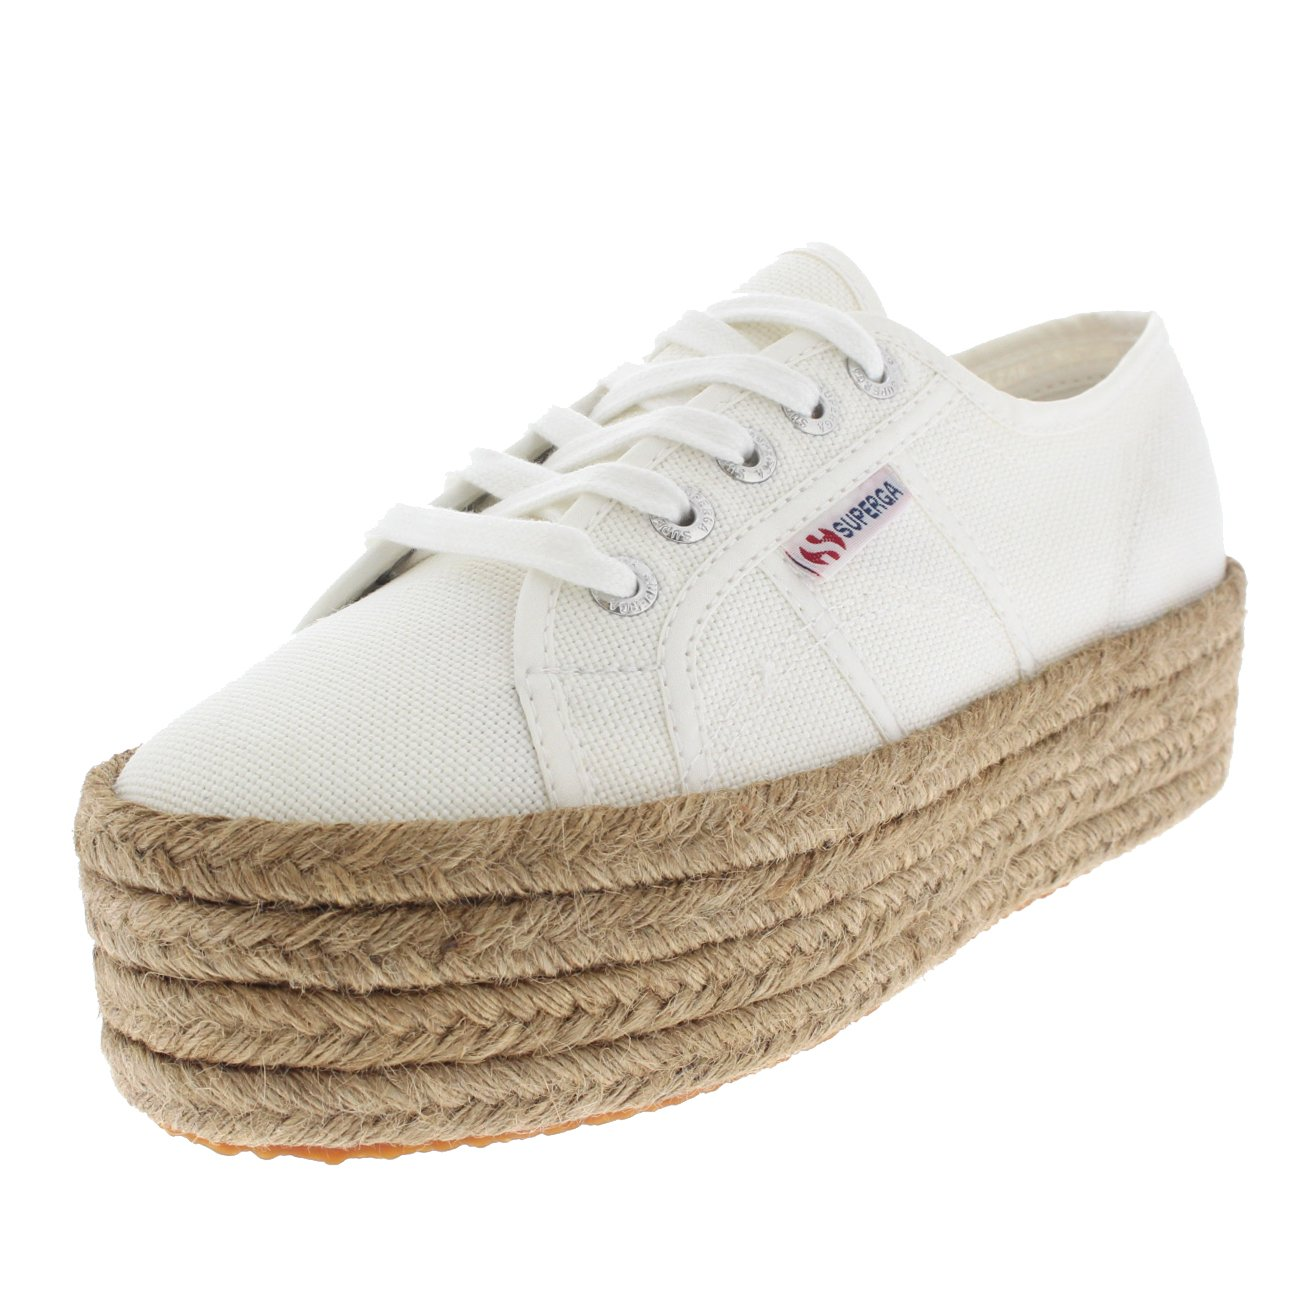 Womens Superga 2790 Cotropew Wedges Summer Casual Flatform Sneakers B072QBHQRG Parent